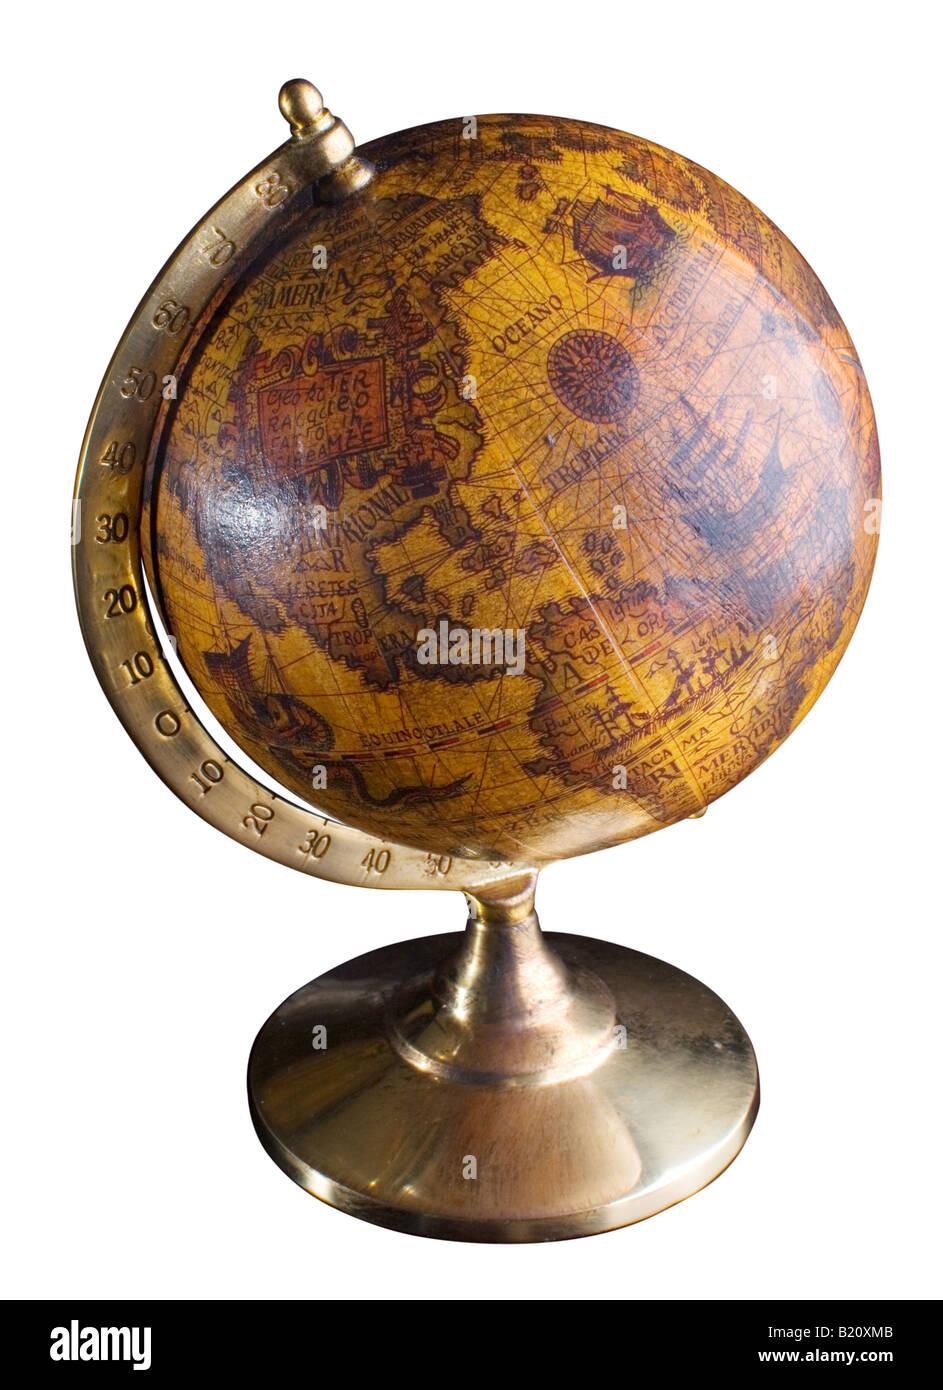 Globe objet sur un fond blanc Photo Stock